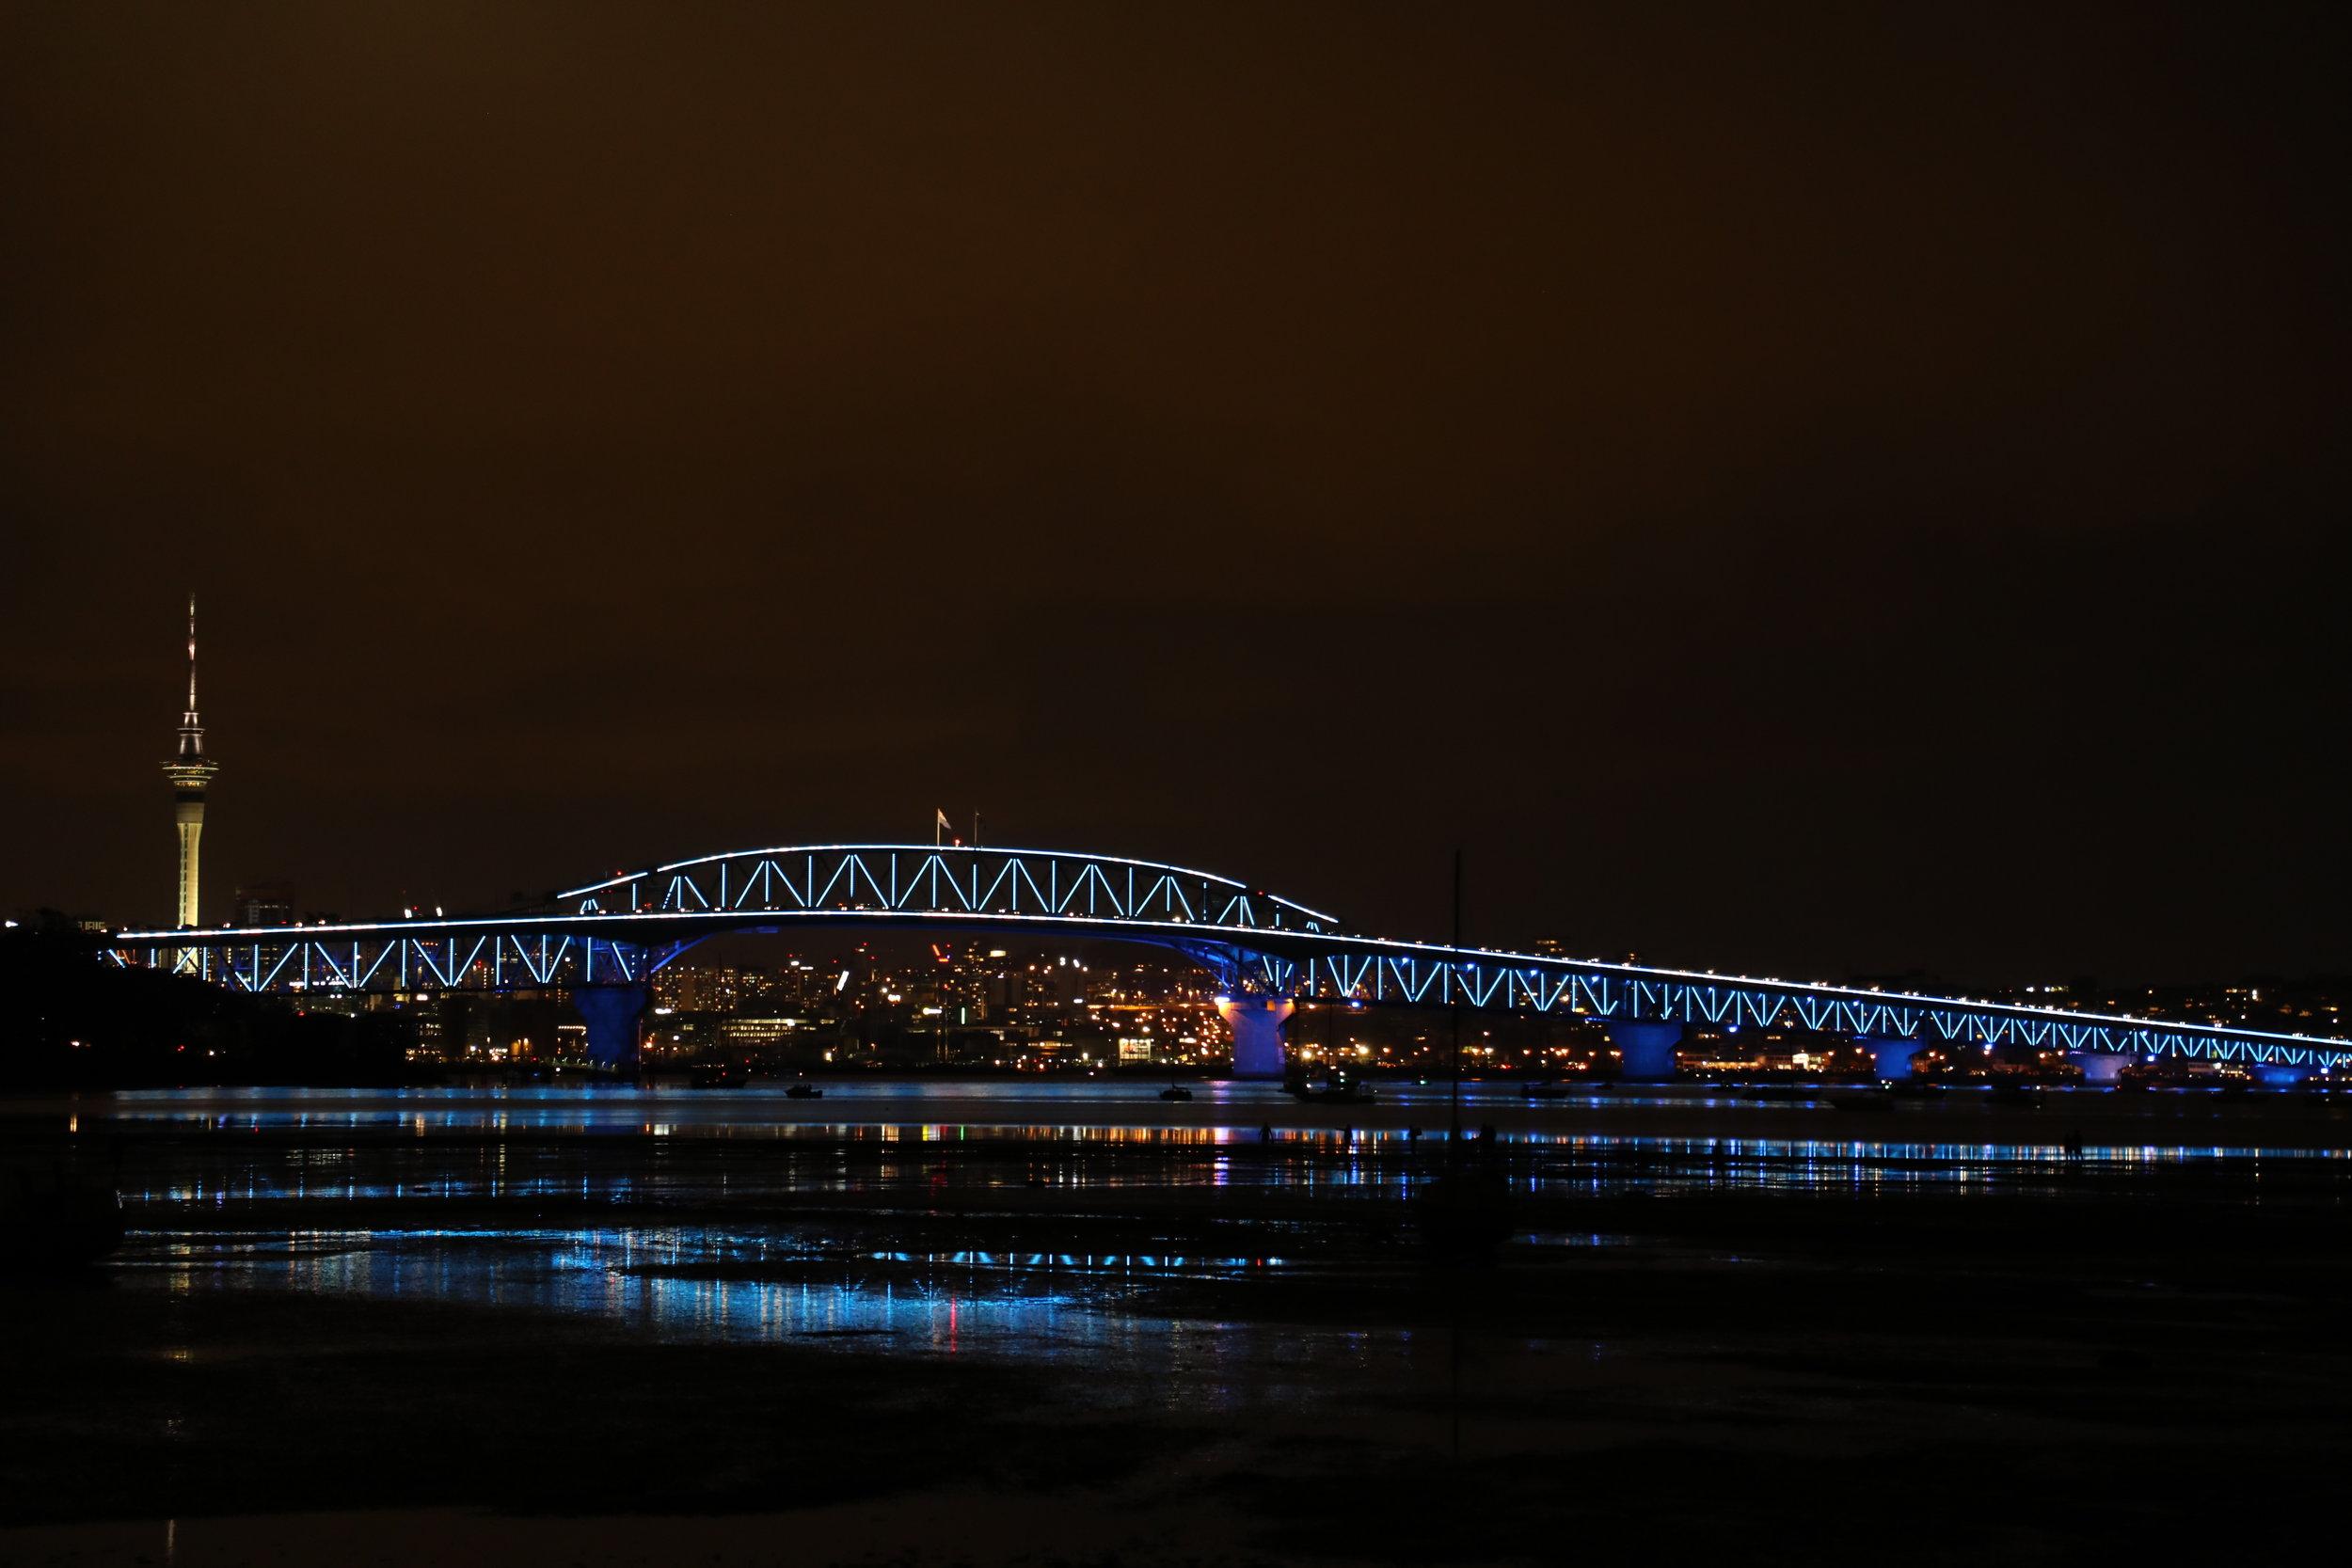 The bridge on Saturday night. Photo courtesy of Hamish Mortland, Colenso BBDO